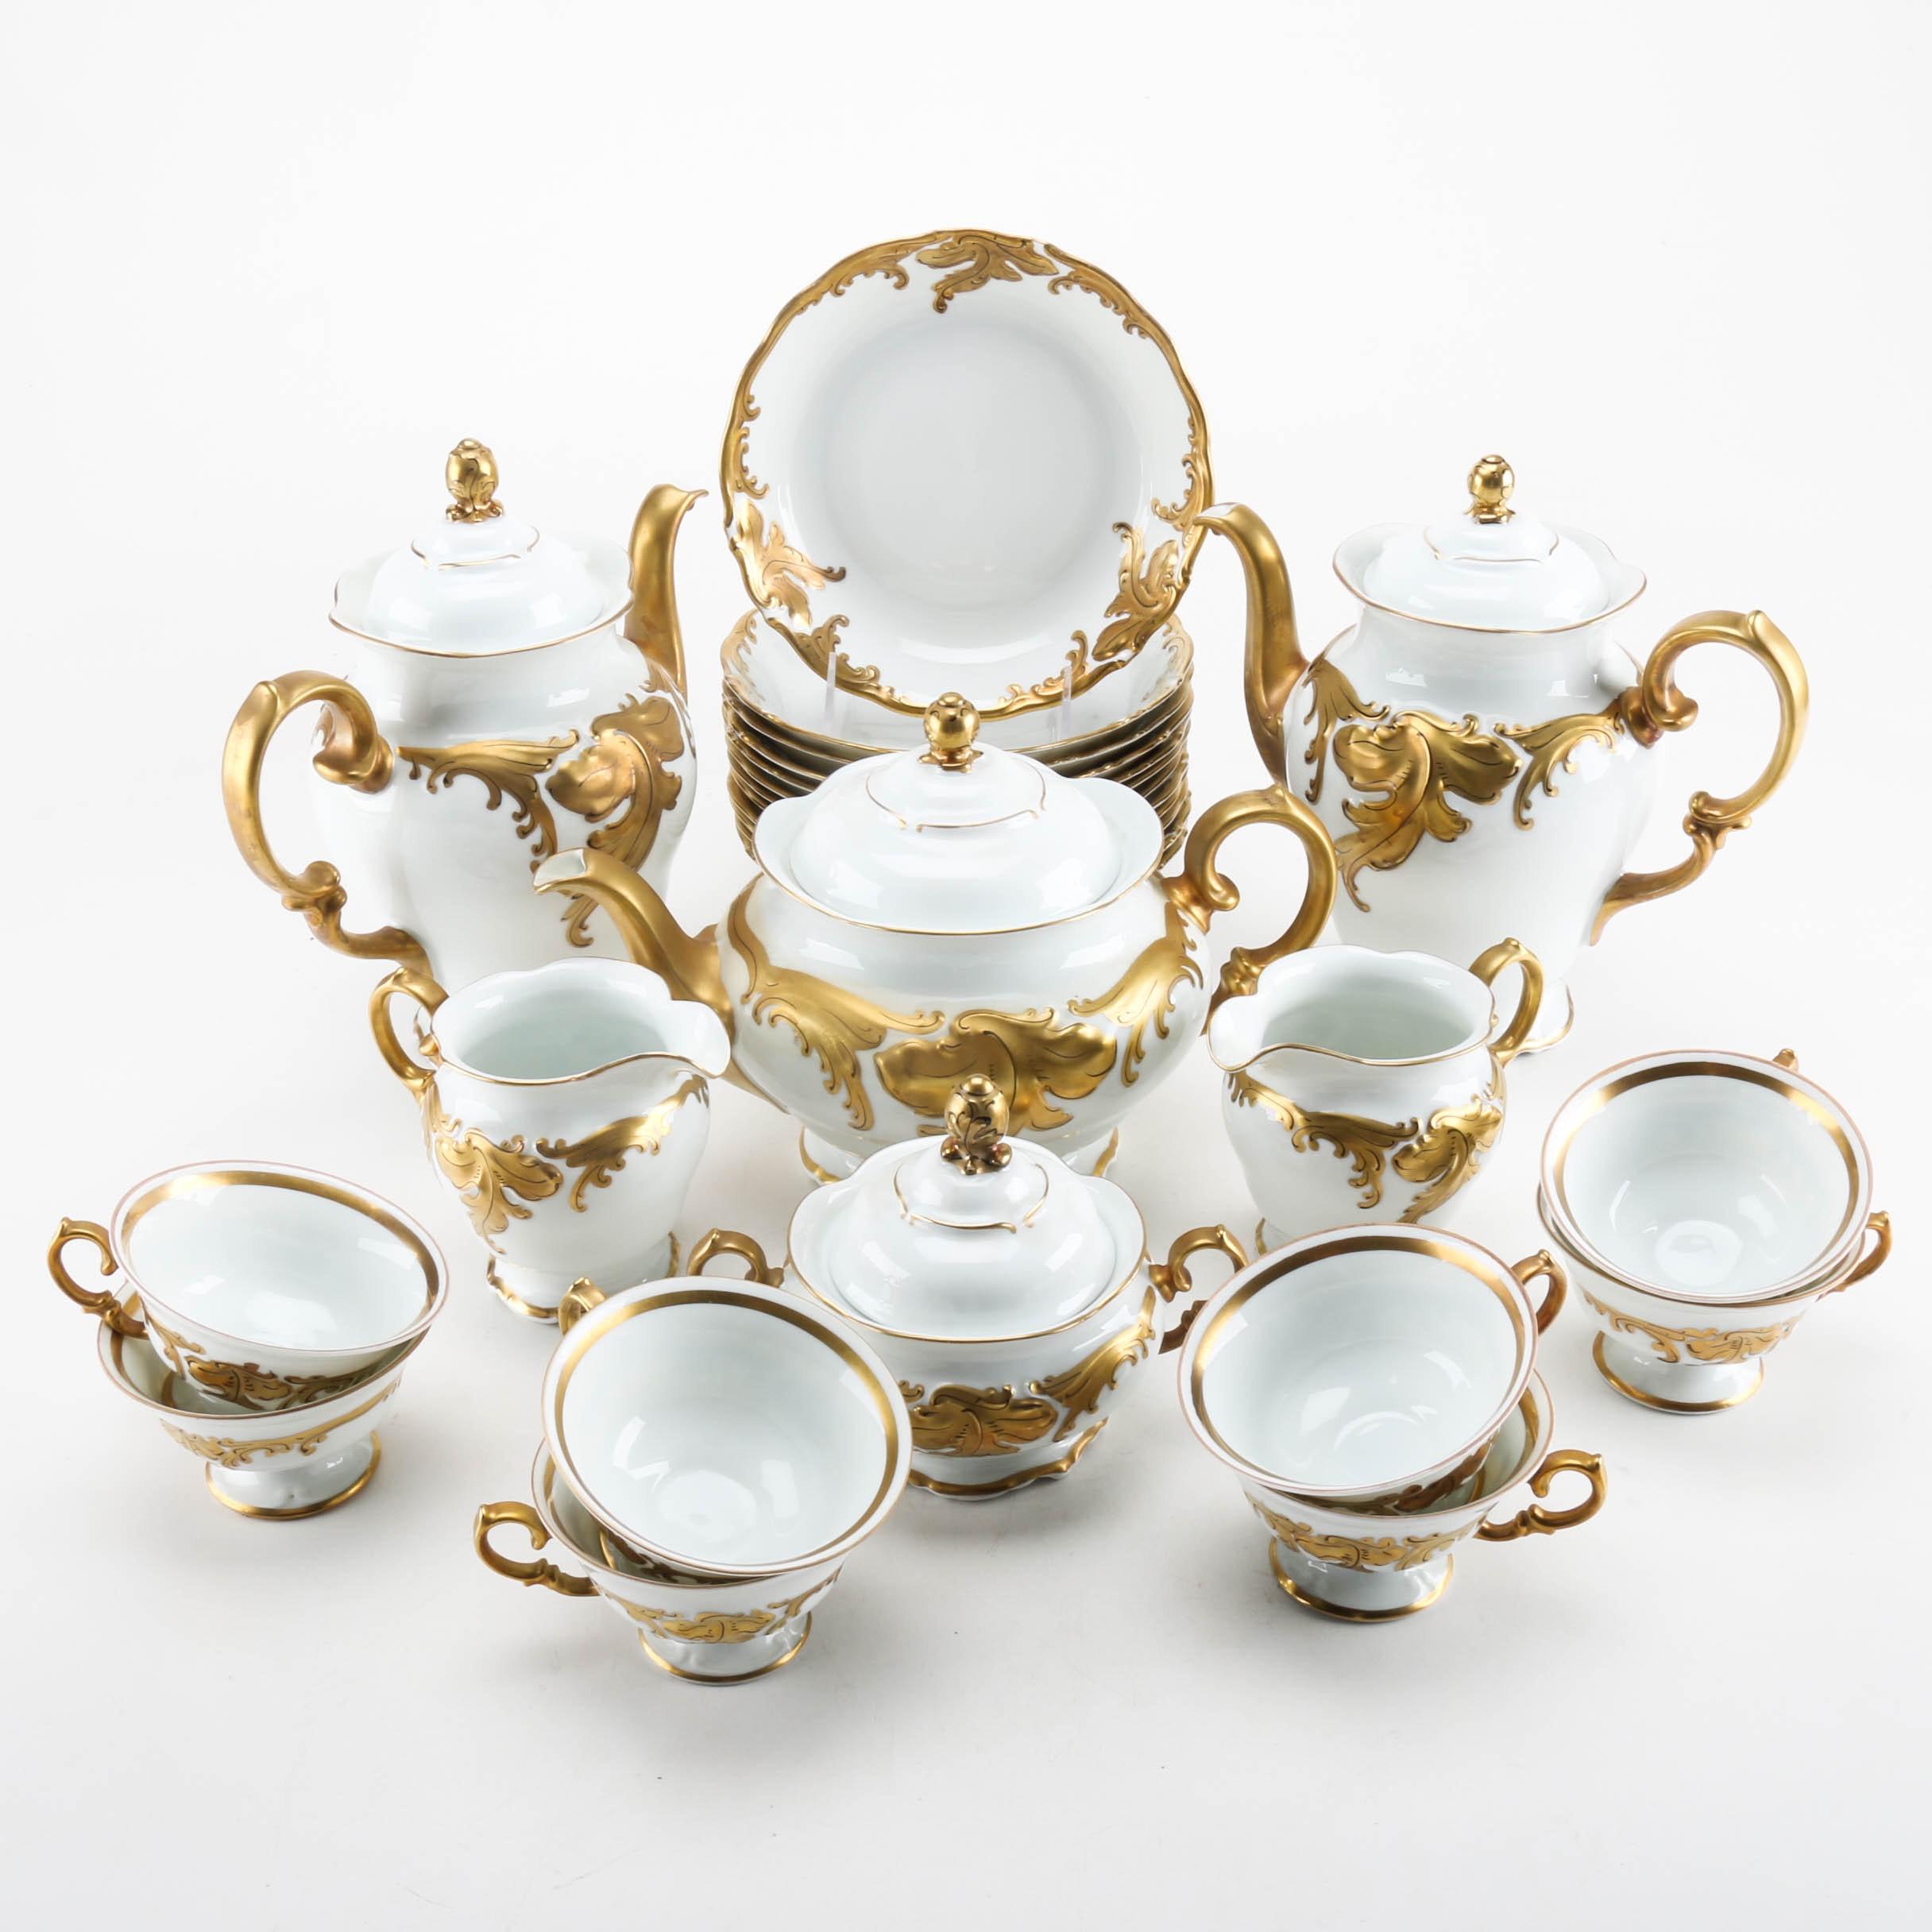 Circa 1950 Polish Porcelain Dinnerware ...  sc 1 st  EBTH.com & Circa 1950 Polish Porcelain Dinnerware : EBTH